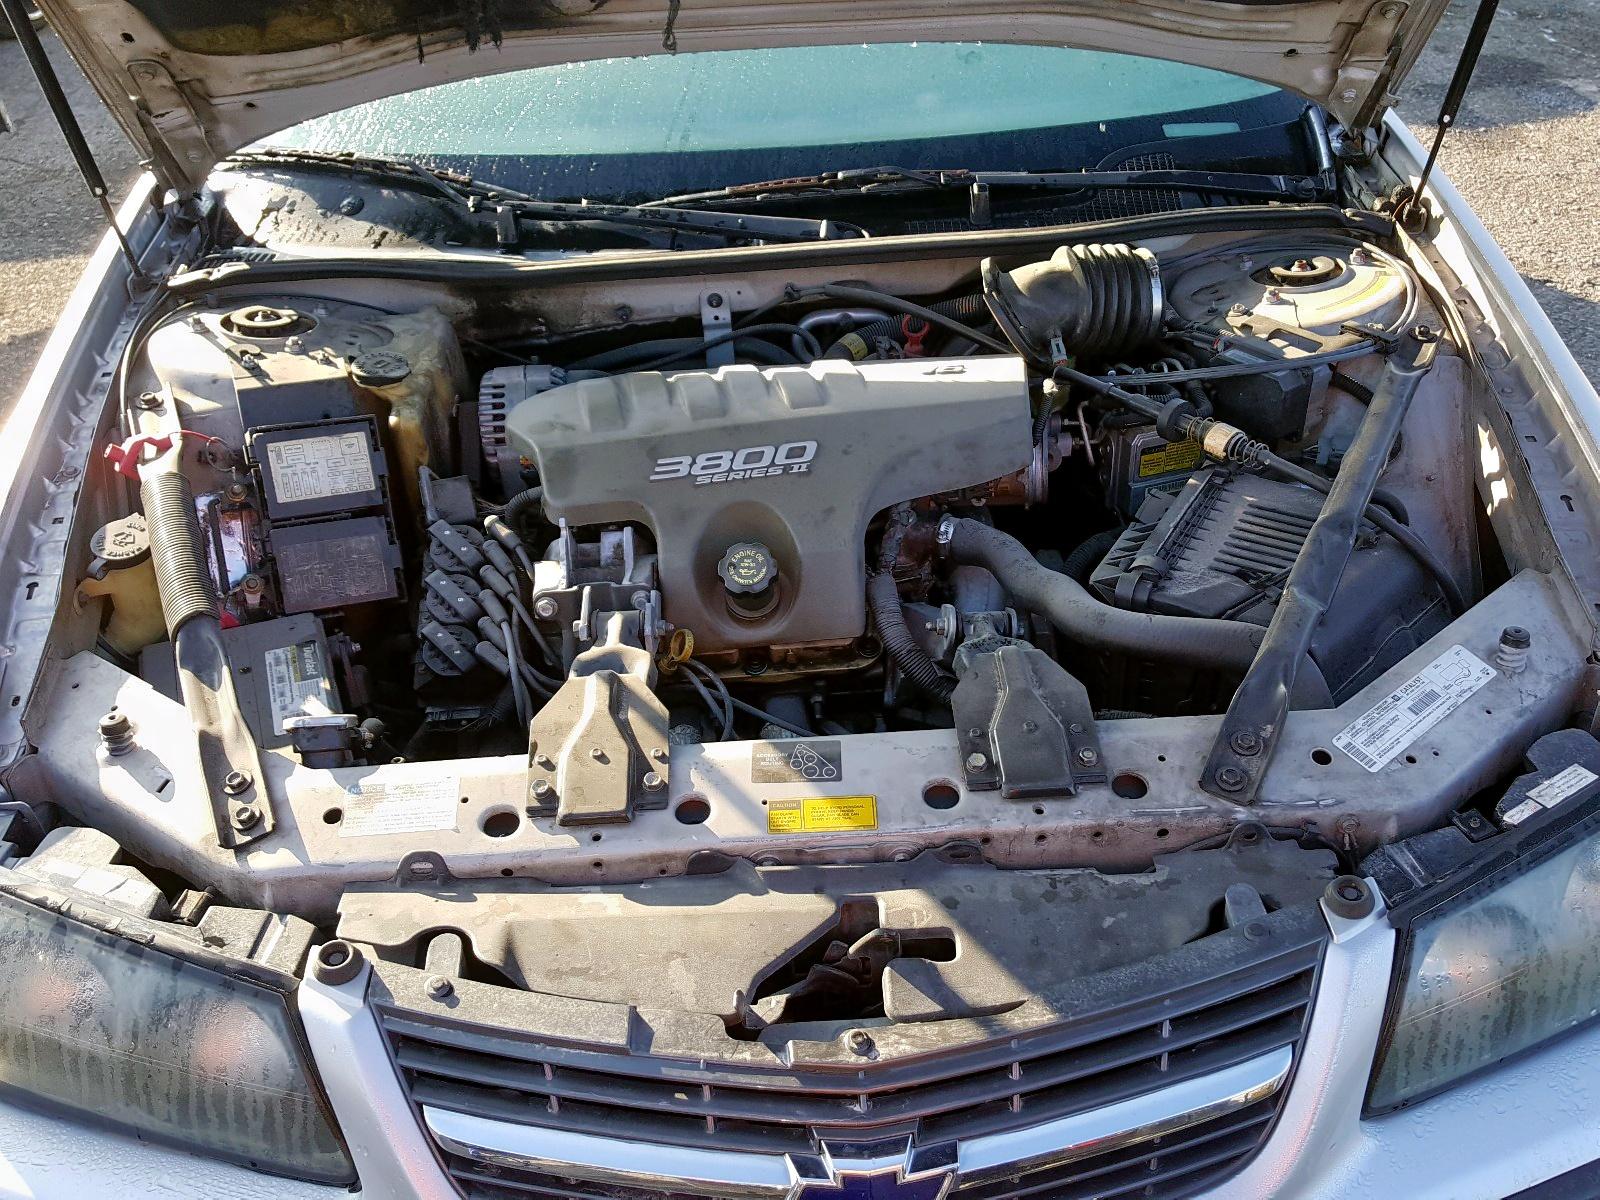 2000 Chevrolet Impala Ls 3.8L inside view